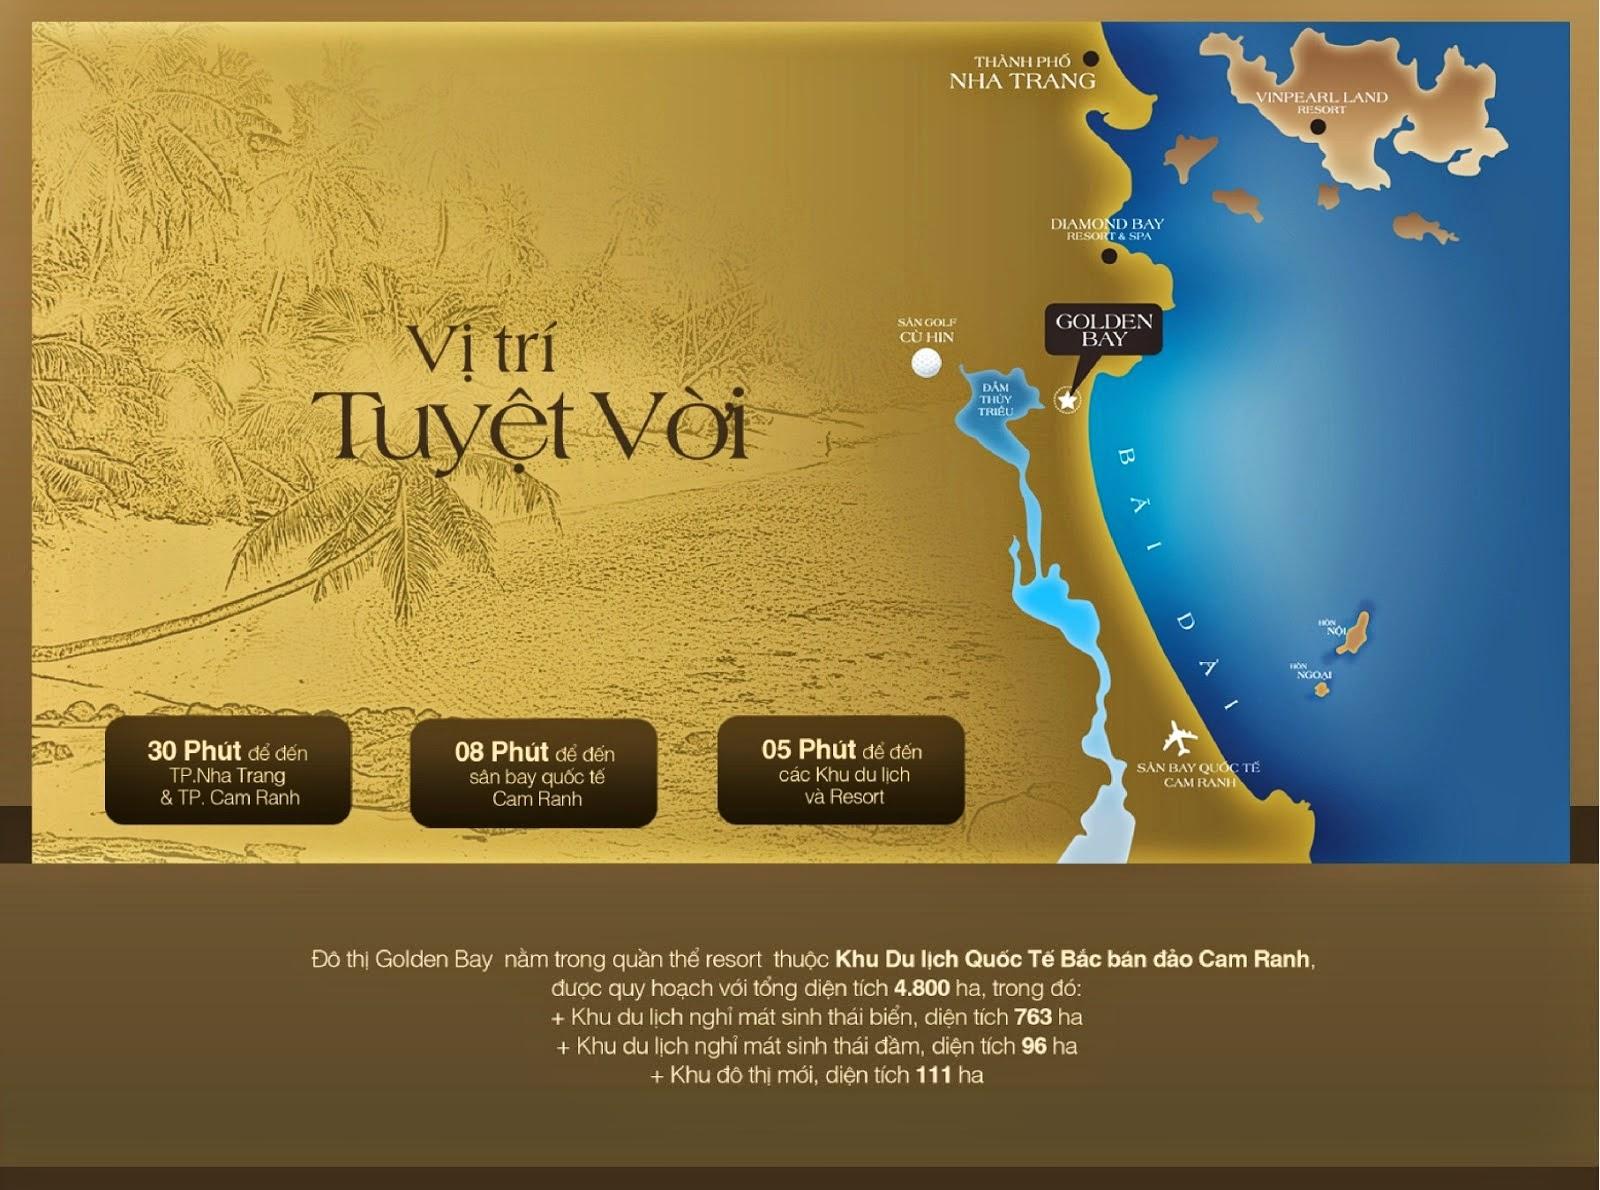 Đất Nền Golden Bay Cam Ranh